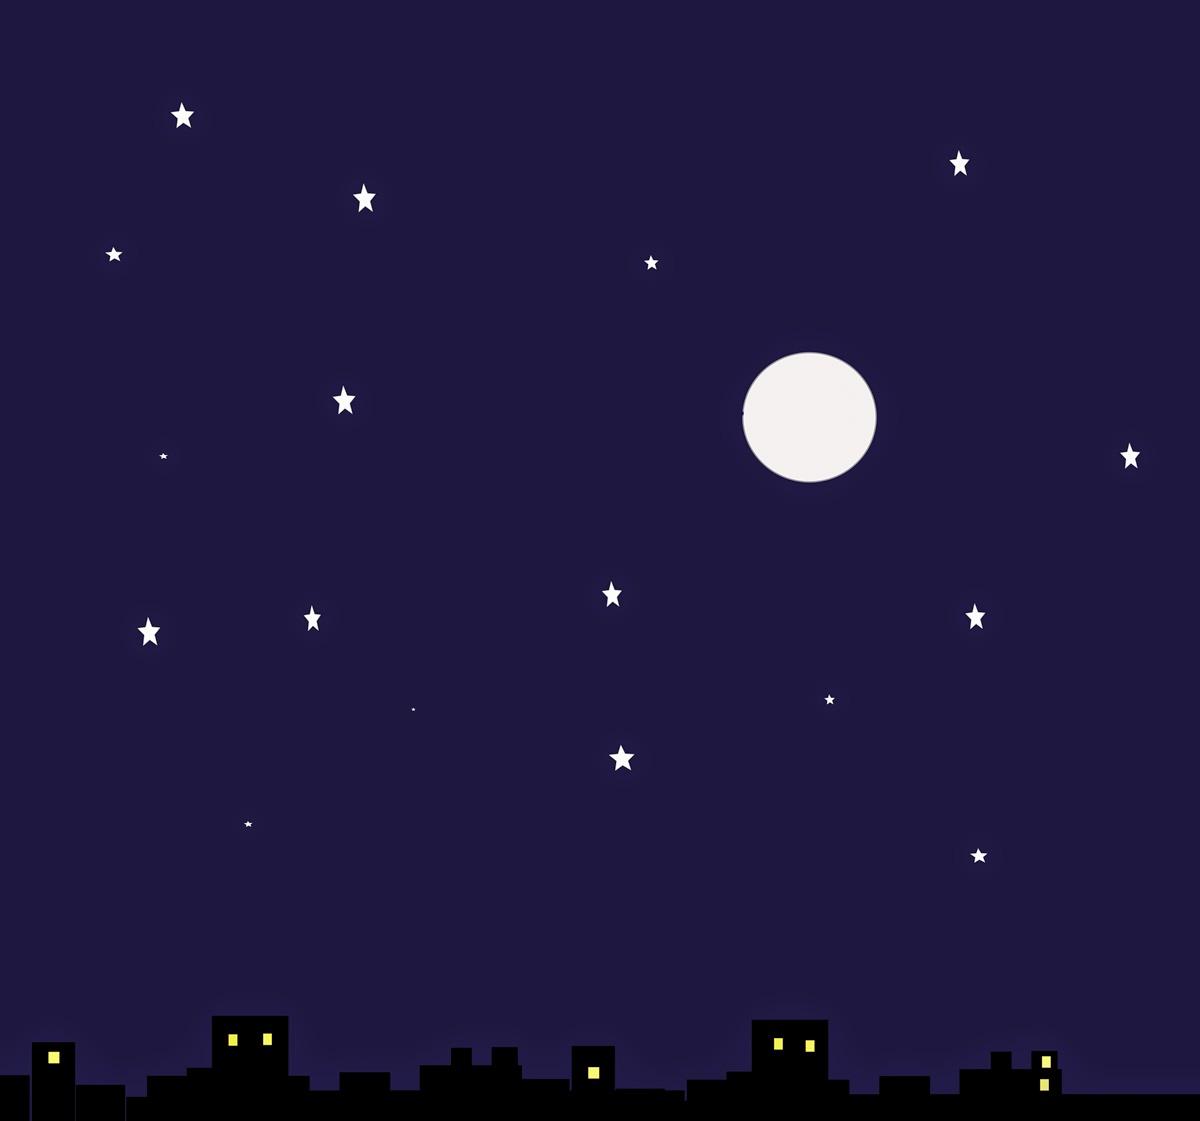 Night, Noche, Nit, Nuit, Nacht, 夜